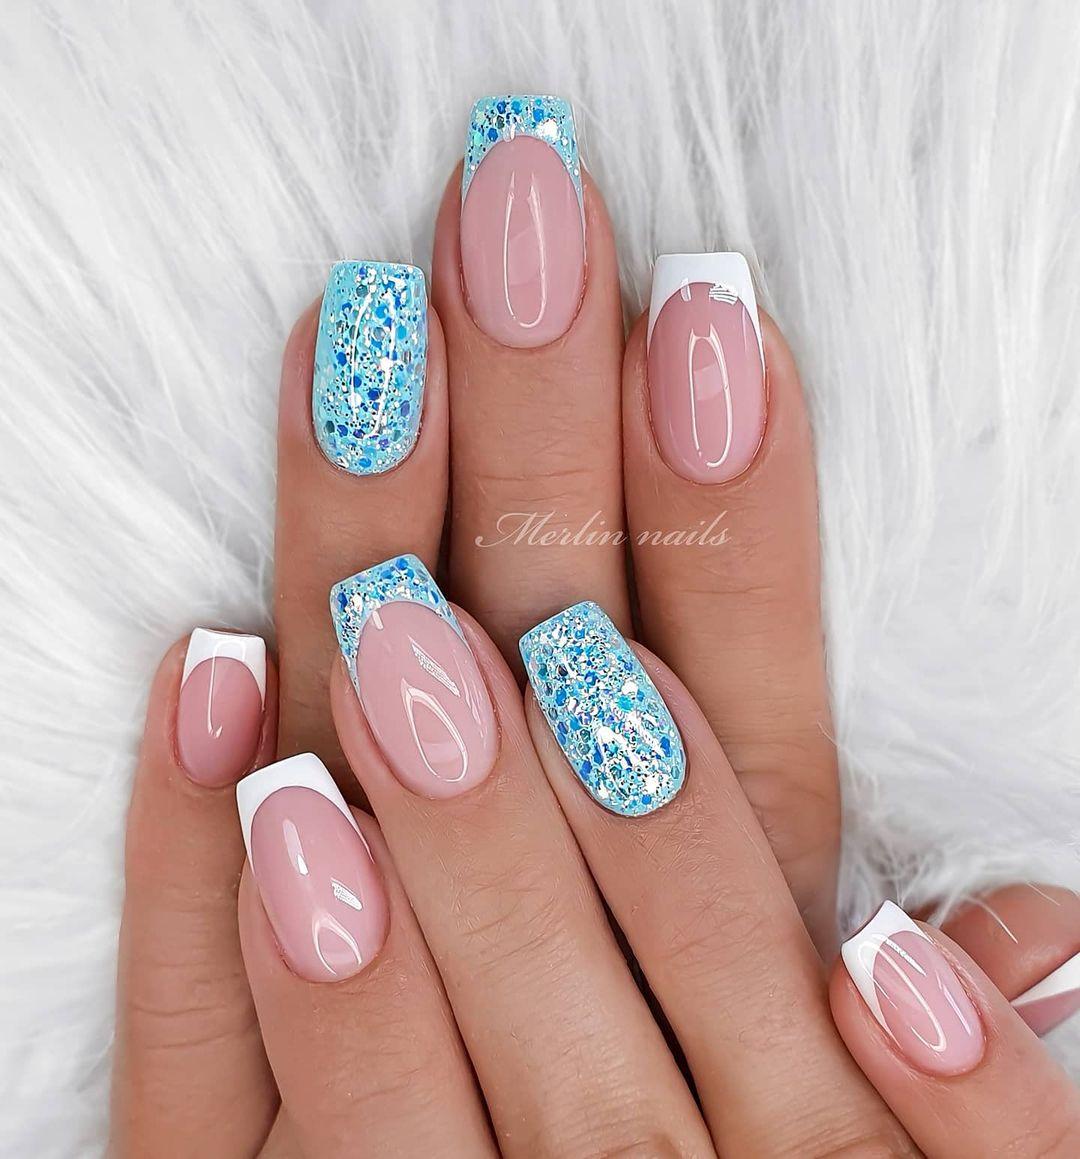 clear nails with francesinha 21